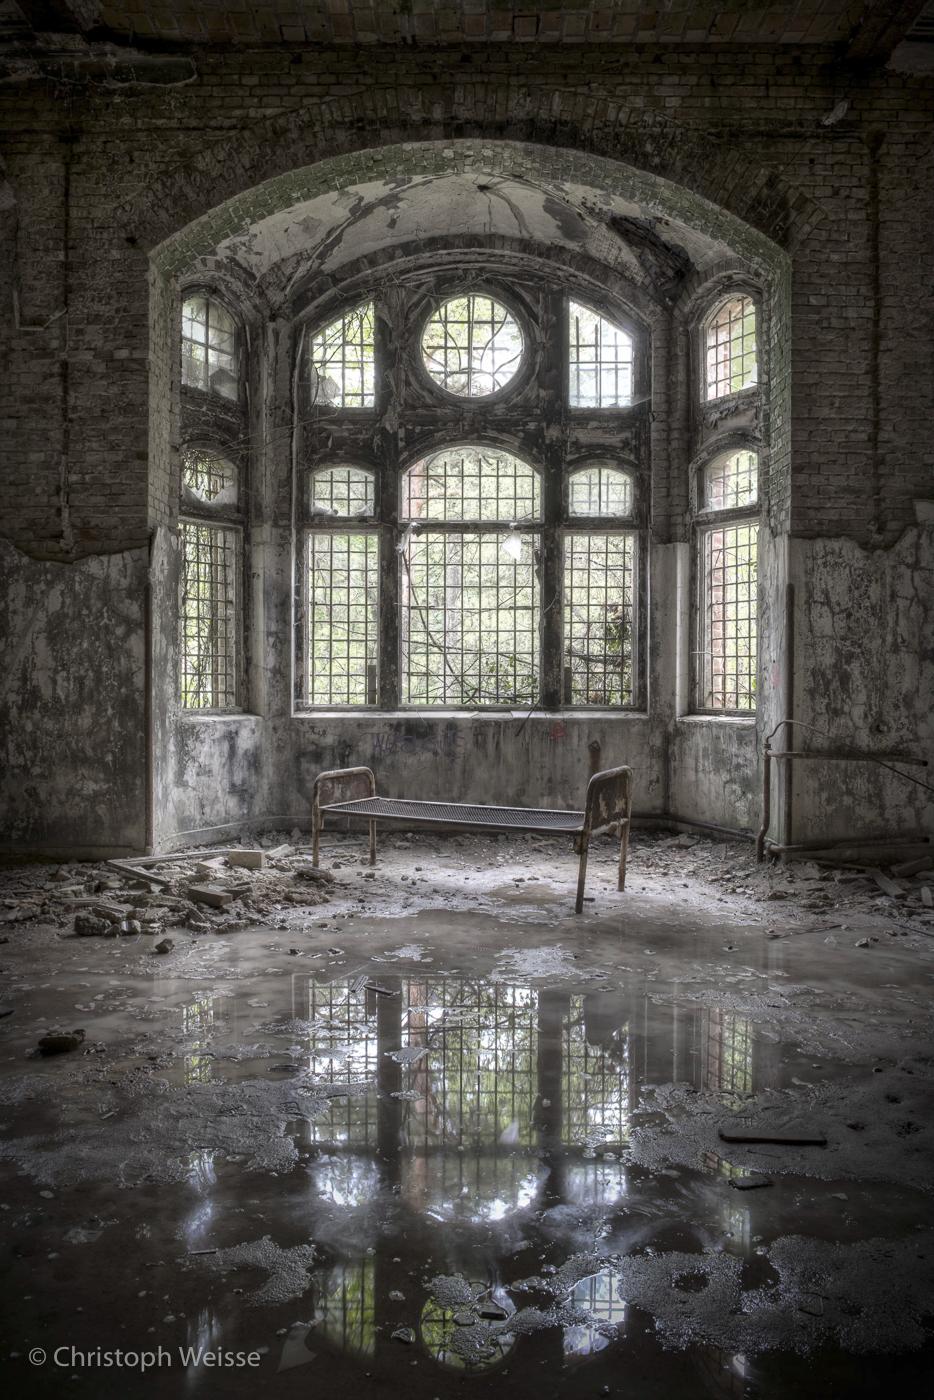 Vergessene Ort-ChristophWeisse-photo18-www.profi-foto.ch-6.jpg